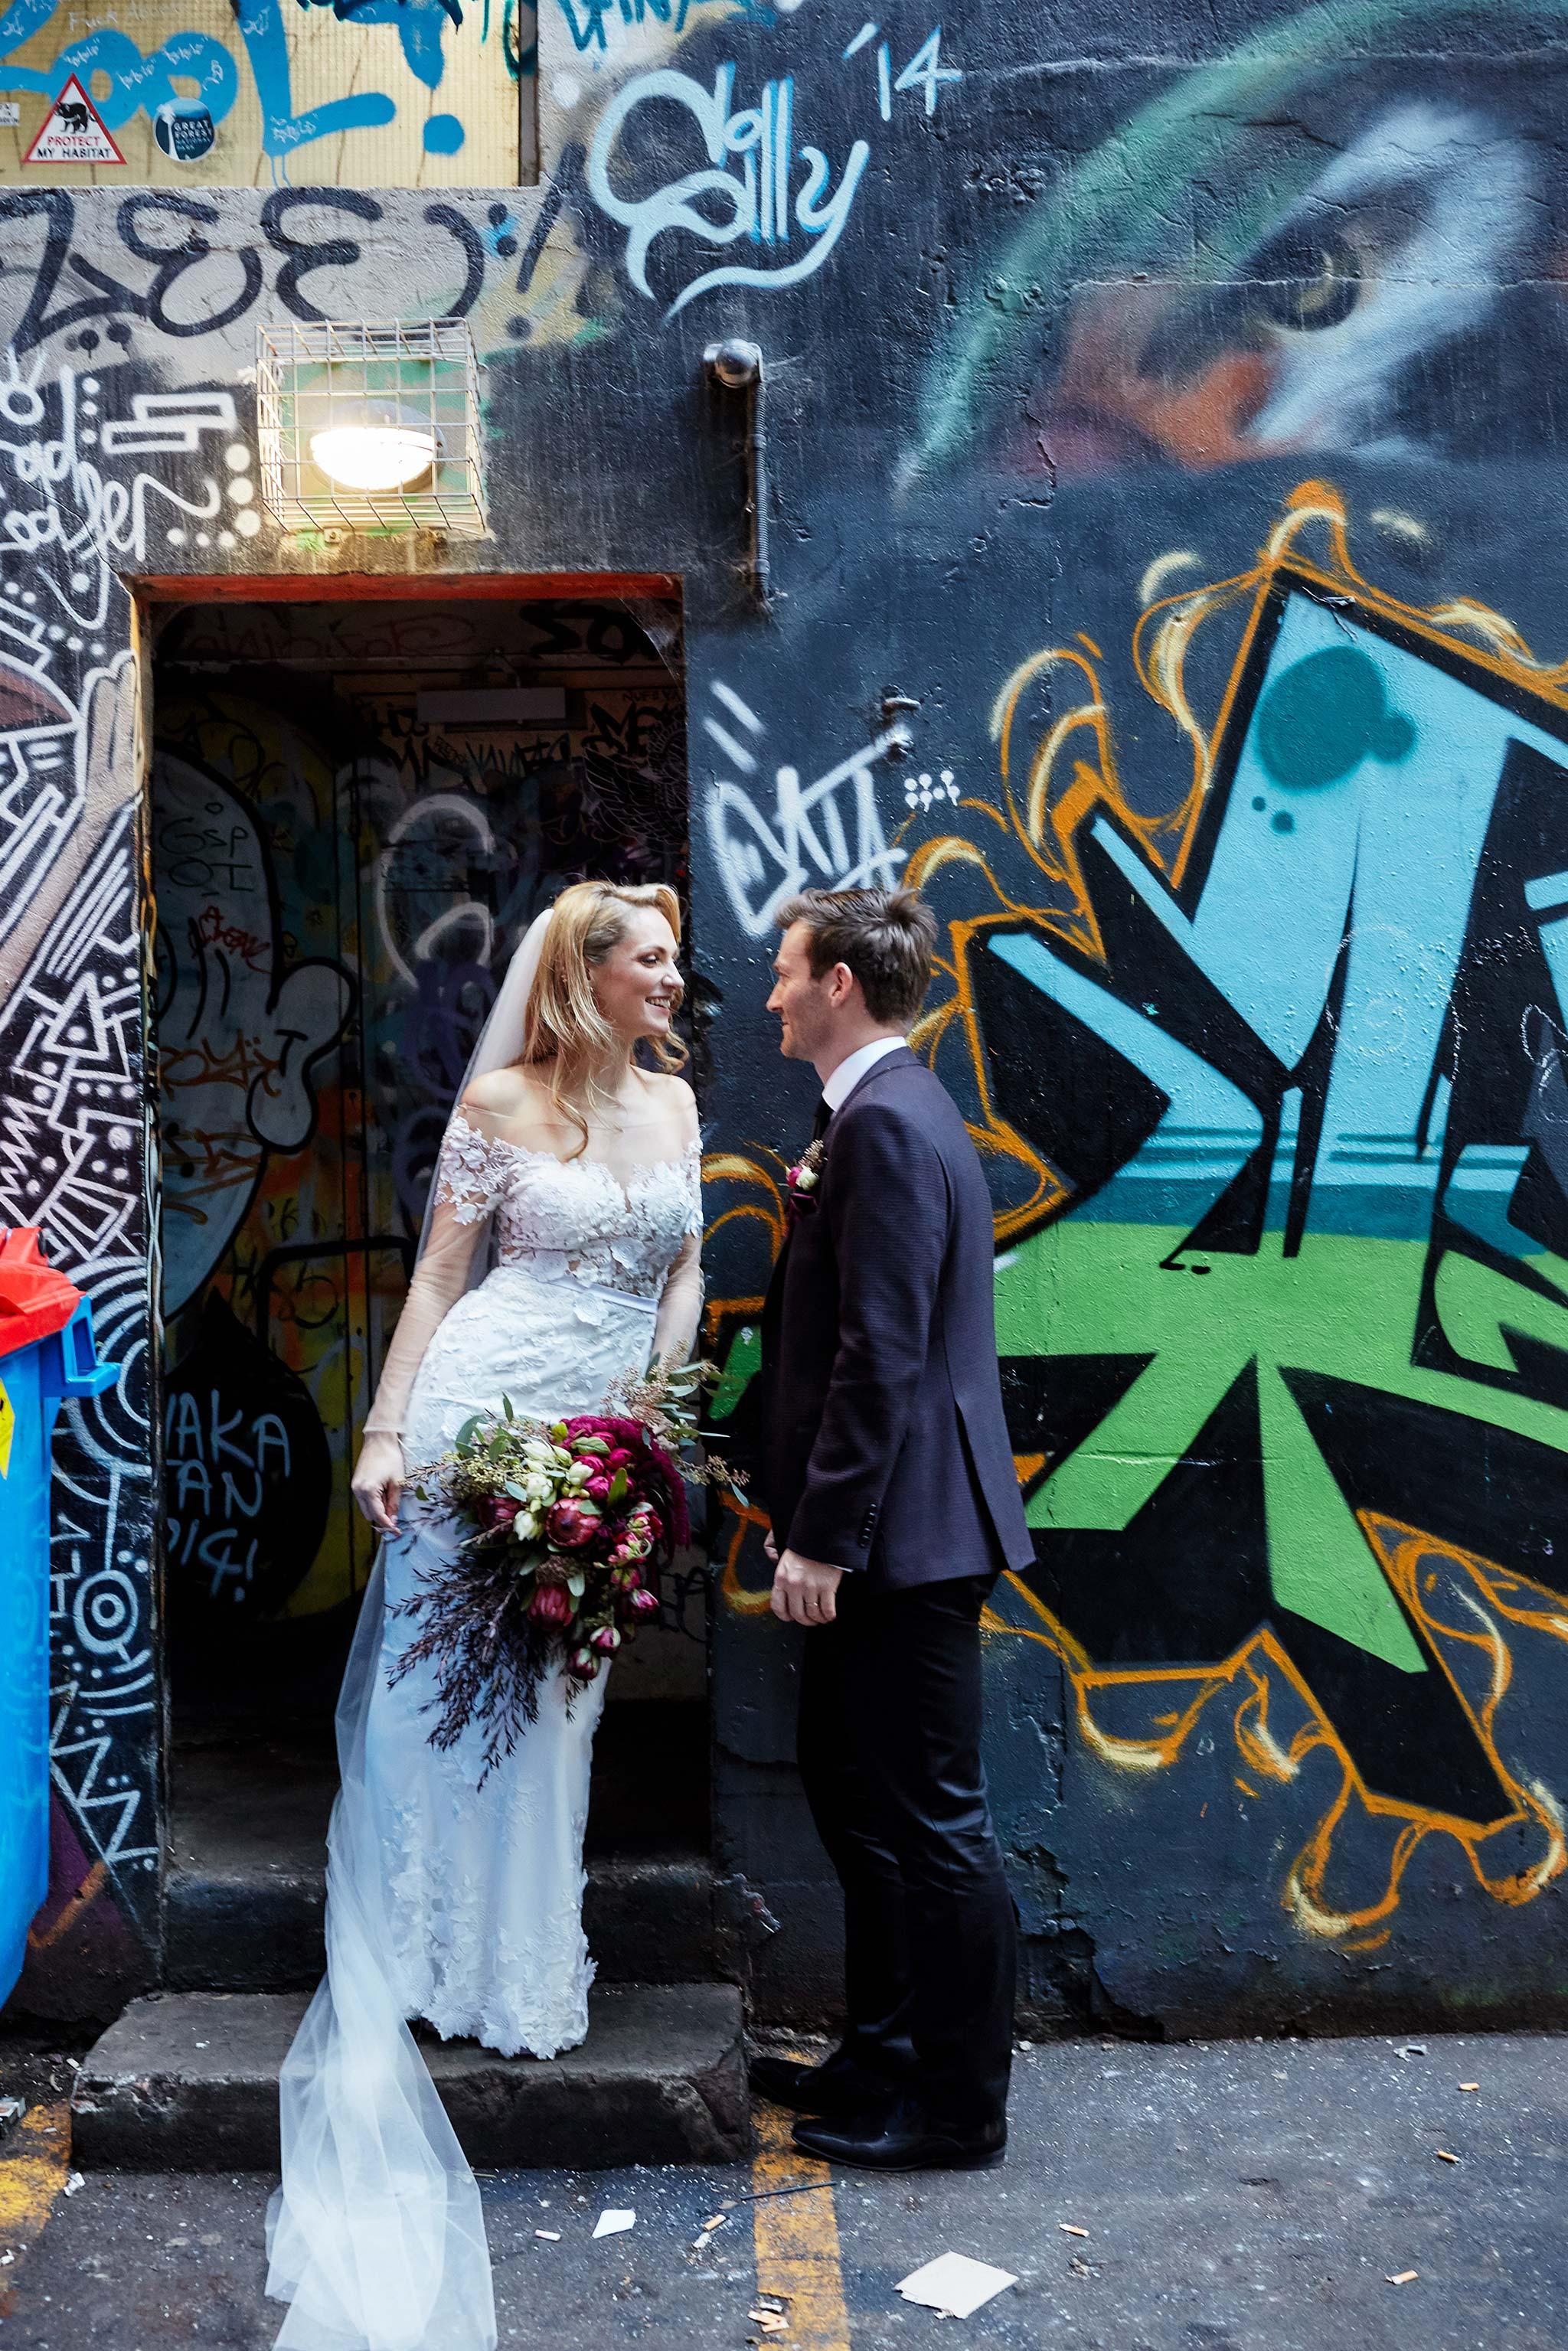 Melbourne-alley-wedding-photographer-bride-groom-portrait-graffiti